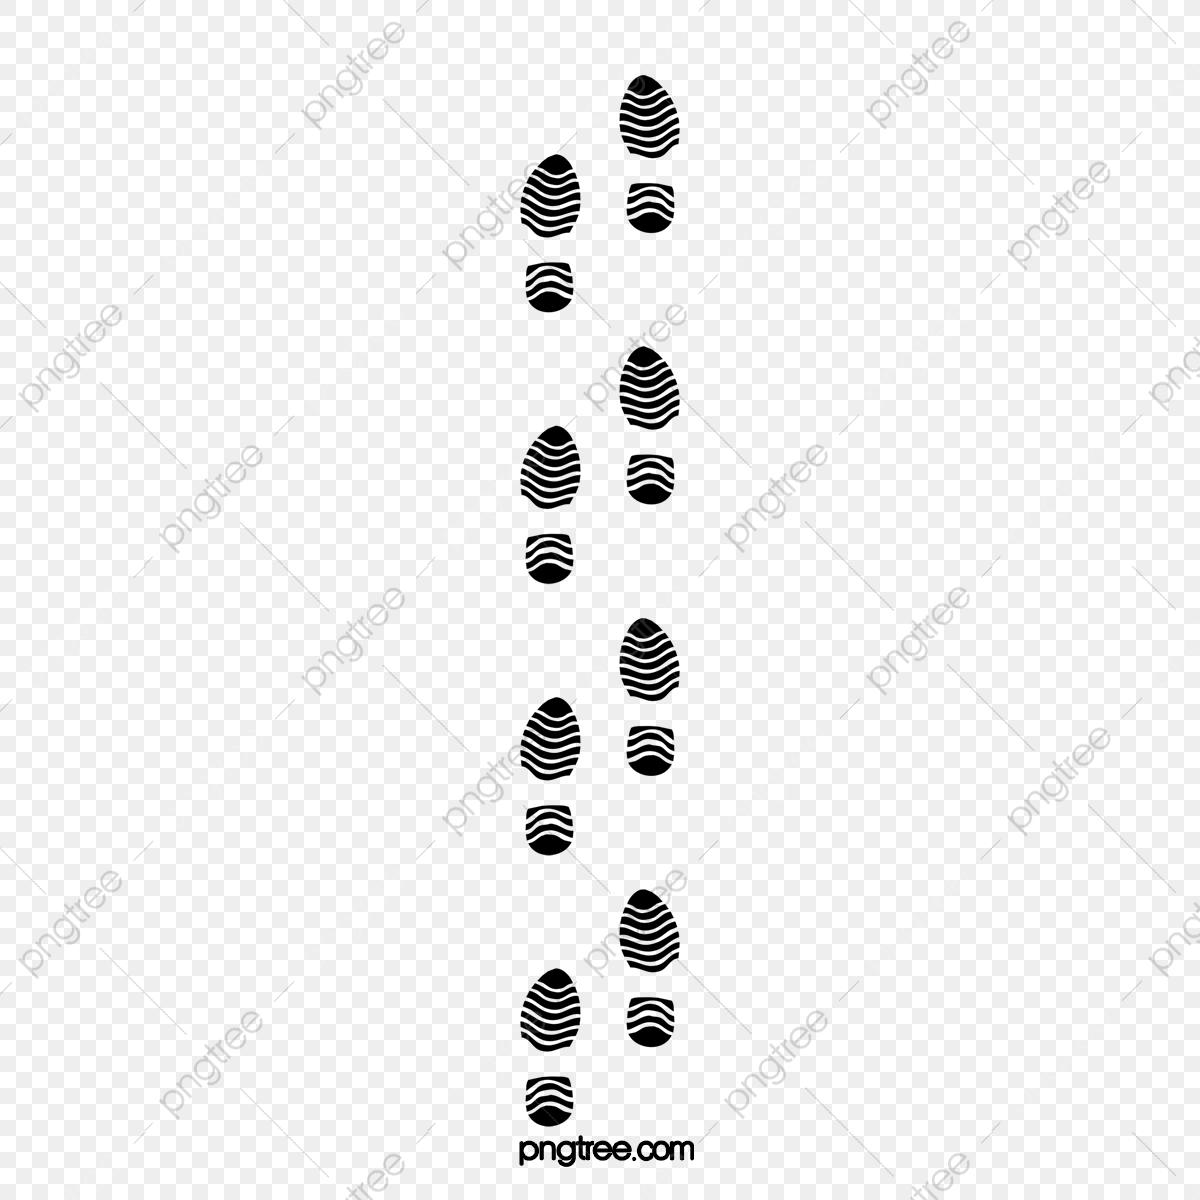 A Row Of Footprints On The Snow, Footprint, Snow Footprints, Snow.